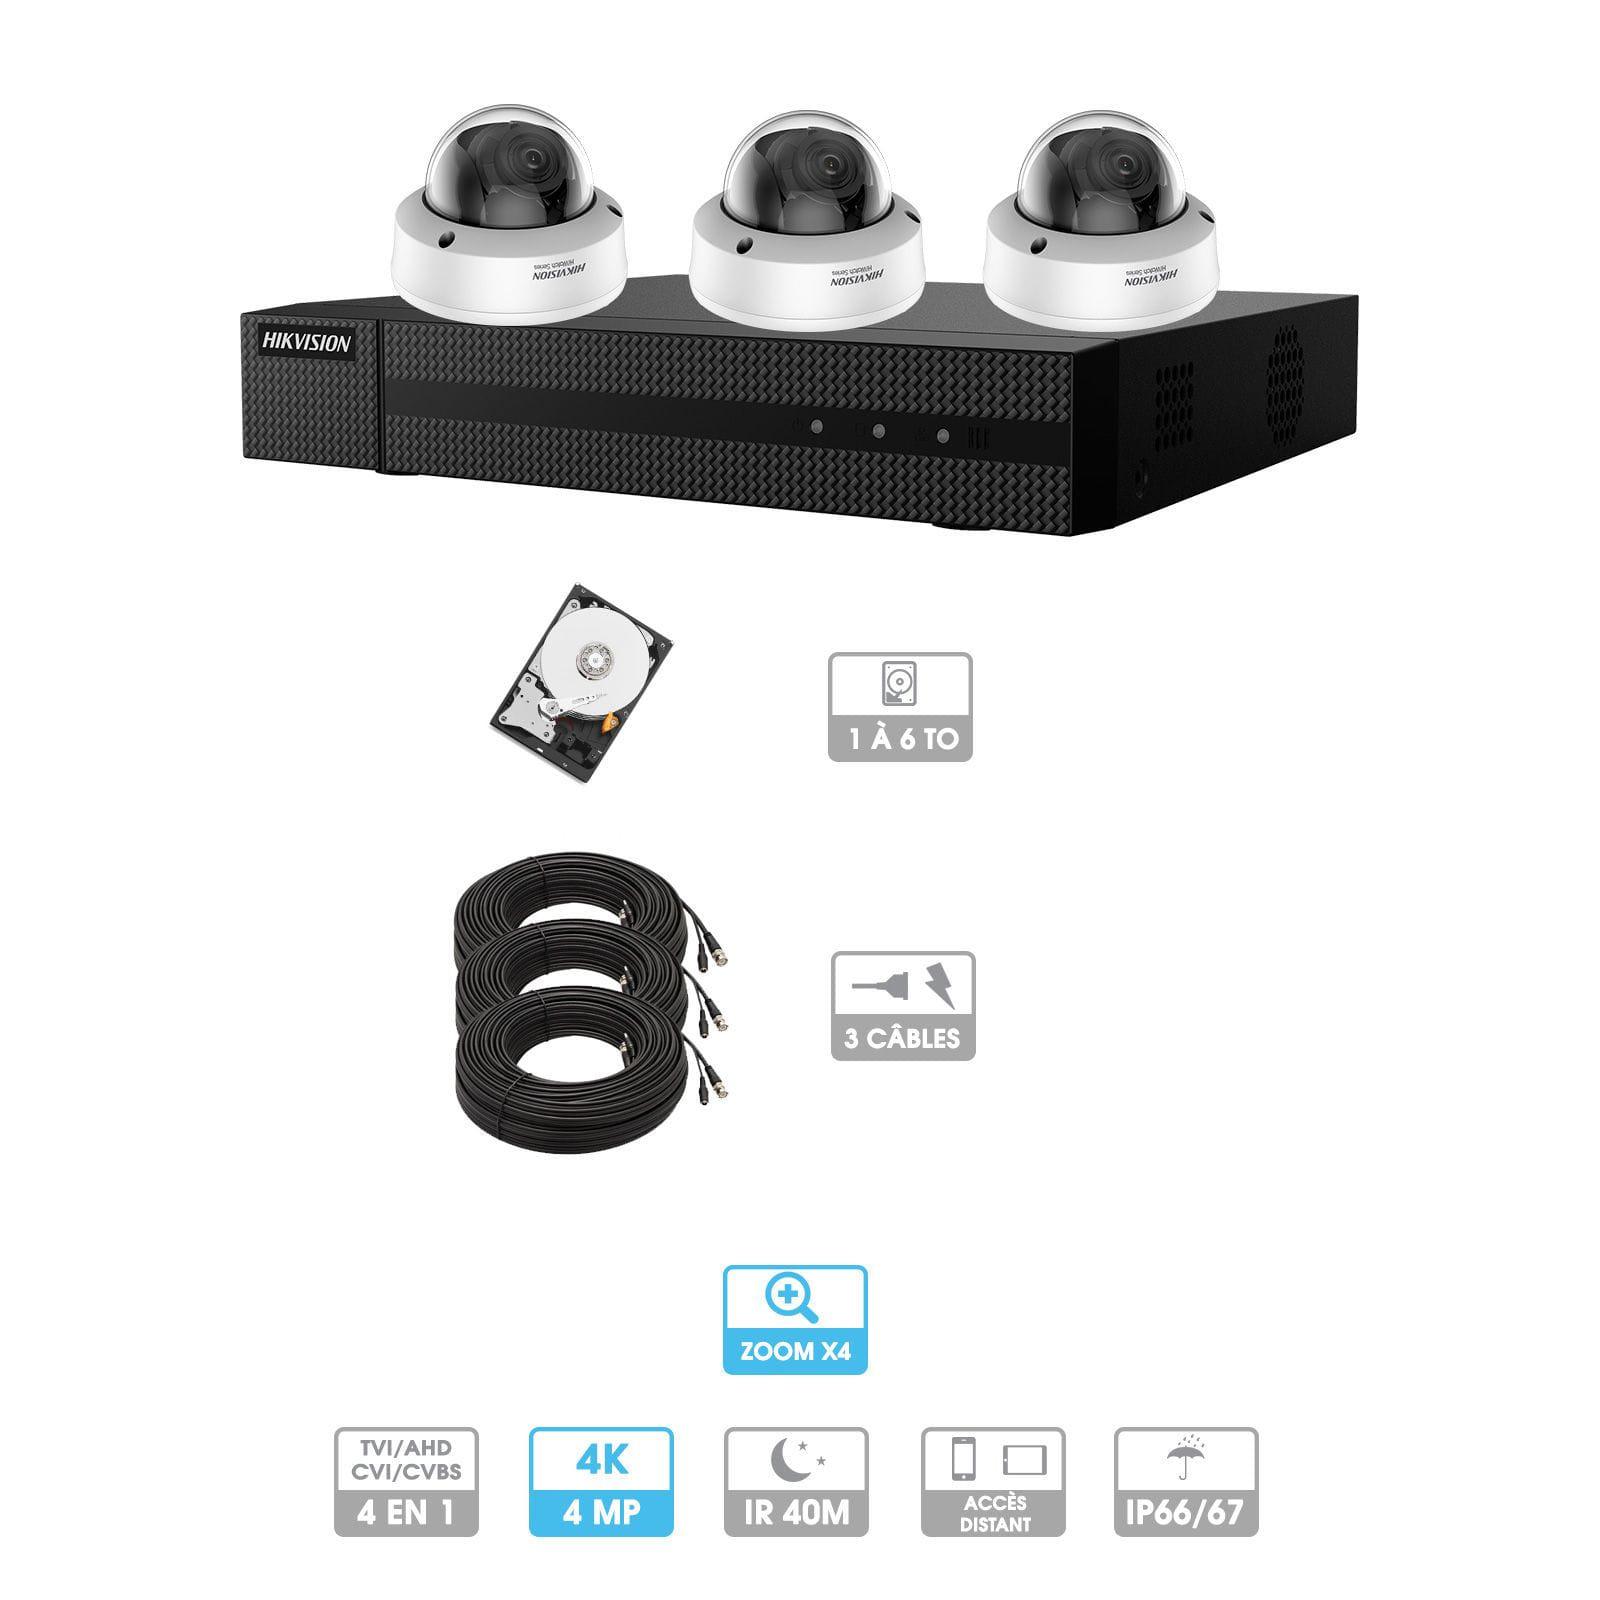 Kit vidéosurveillance 3 caméras | 4MP HD | 3 câbles 20 mètres | HDD 1To | Dômes Hiwatch | Zoom x 4 | Antivandalisme